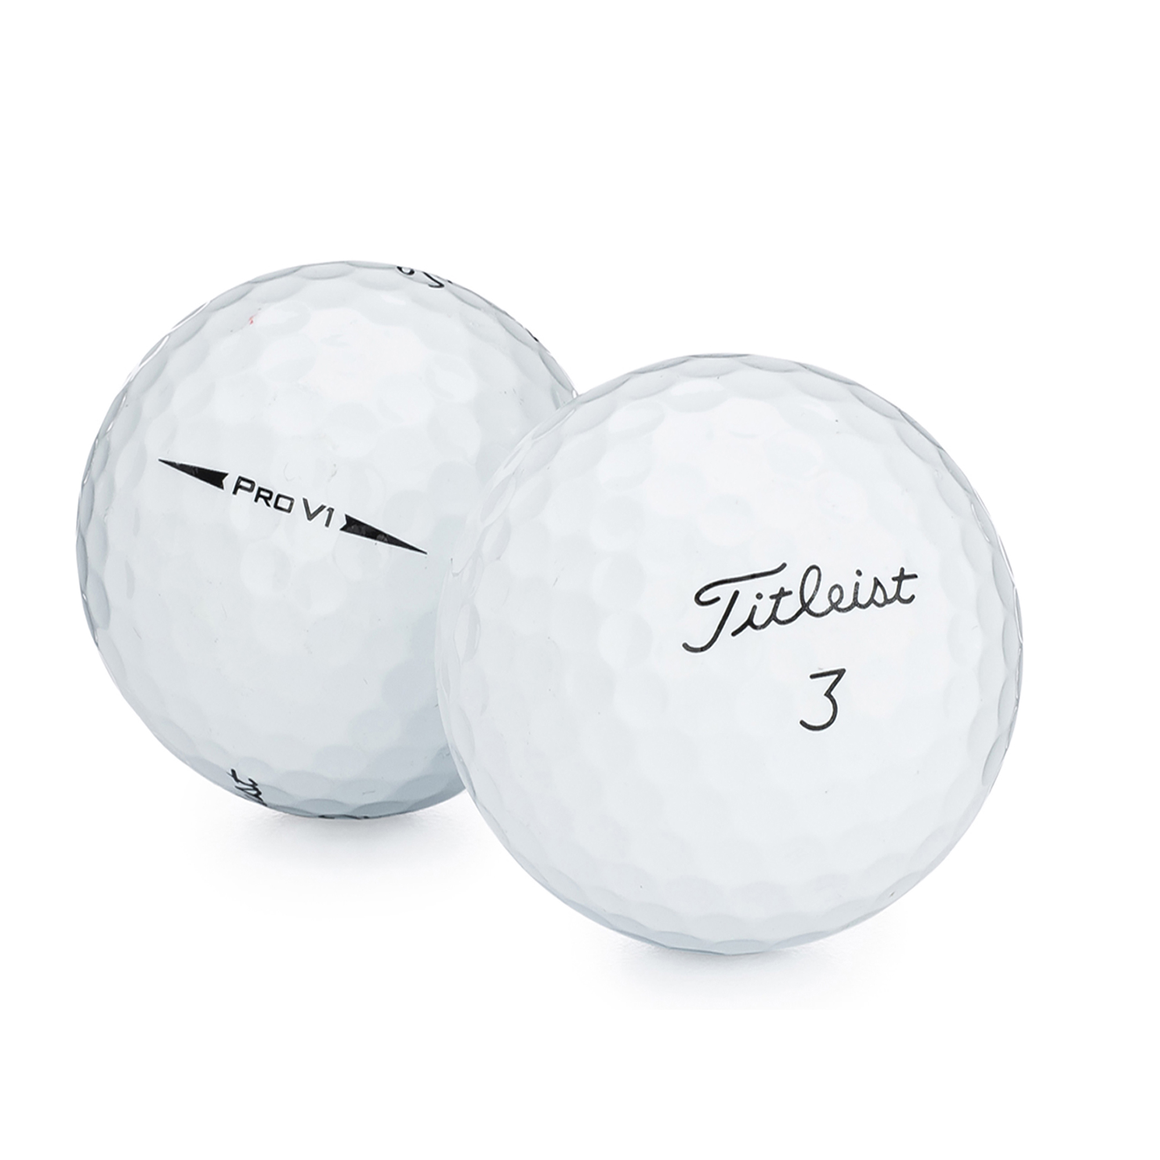 Titleist Pro V1 Golf Balls, Good Quality, 24 Pack